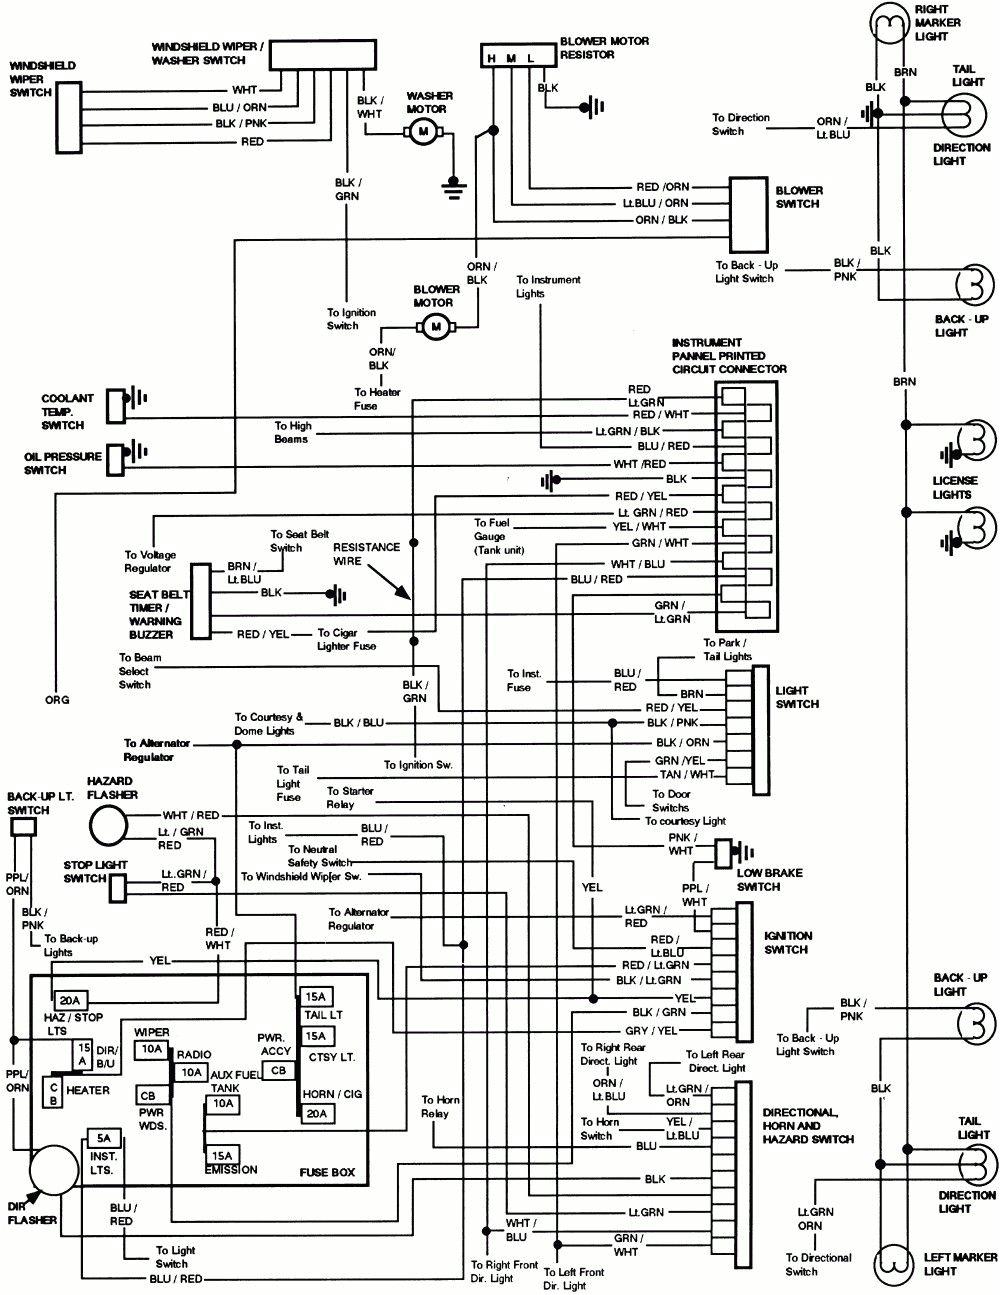 90 f150 wiring diagram wiring diagram standard 90 ford f 250 distributor wiring